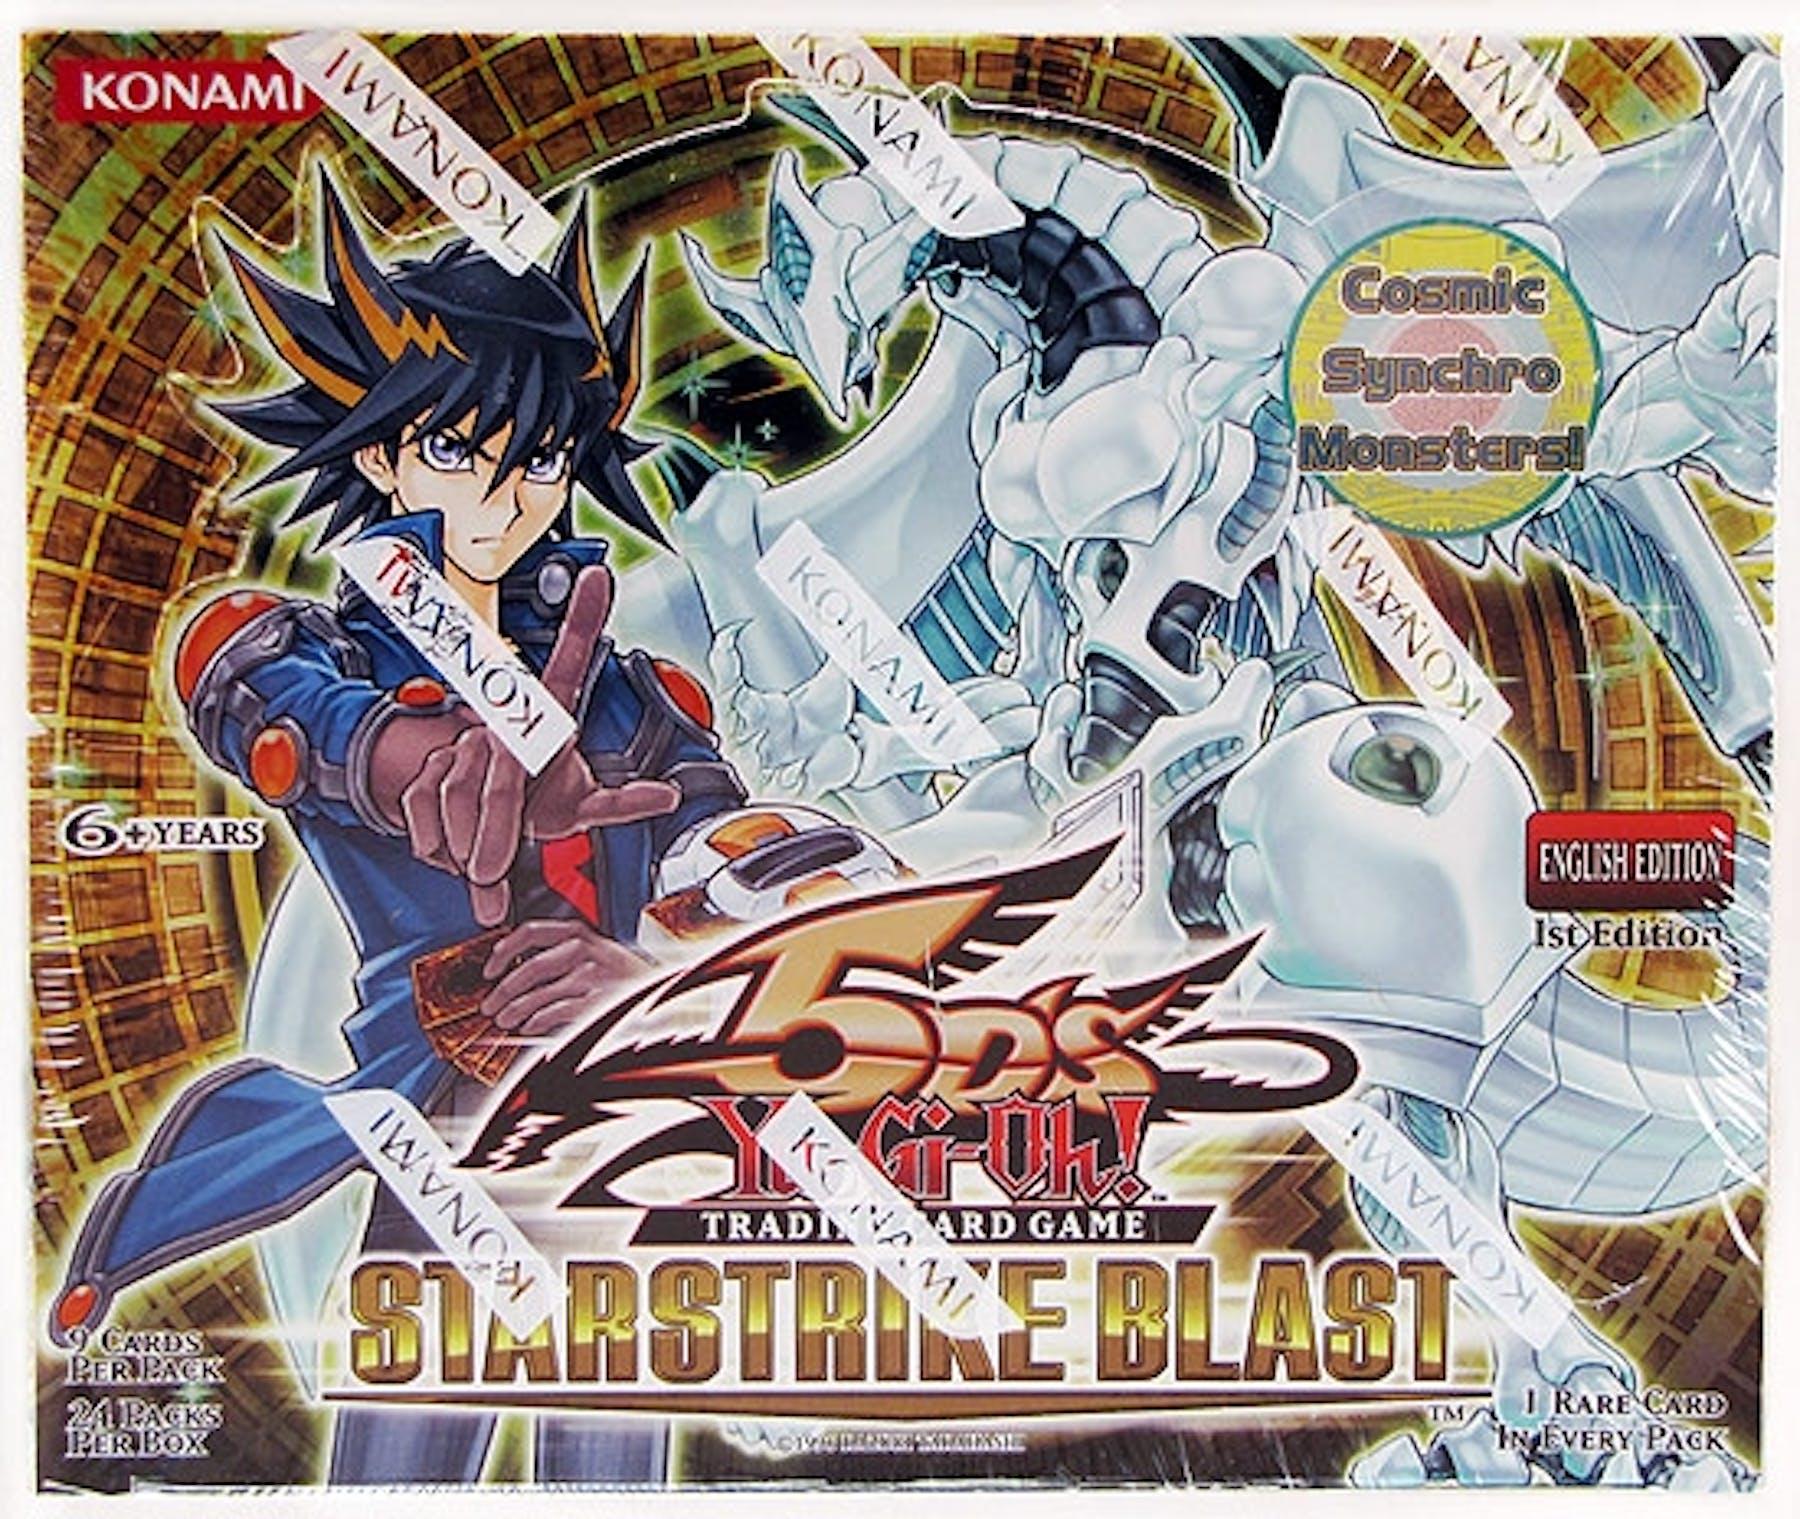 Konami Yu-Gi-Oh Starstrike Blast Booster Box 1st Edition